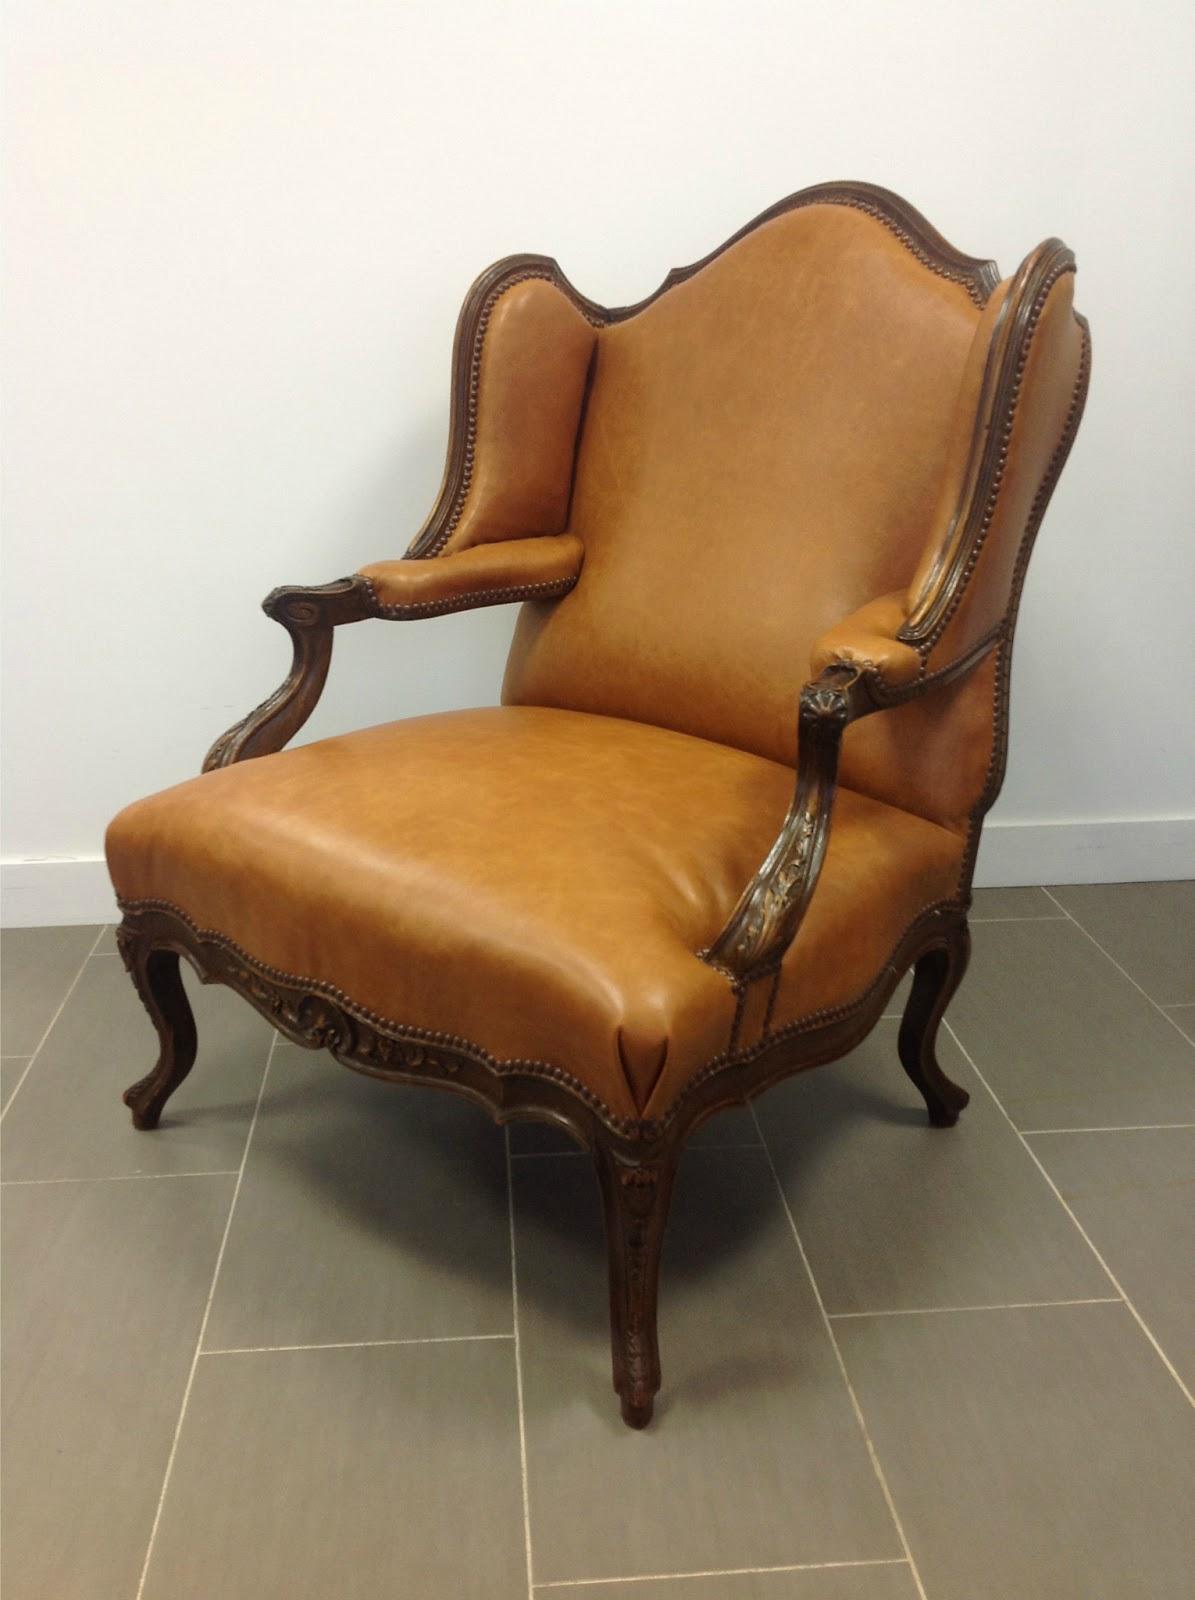 grand fauteuil oreilles en cuir. Black Bedroom Furniture Sets. Home Design Ideas